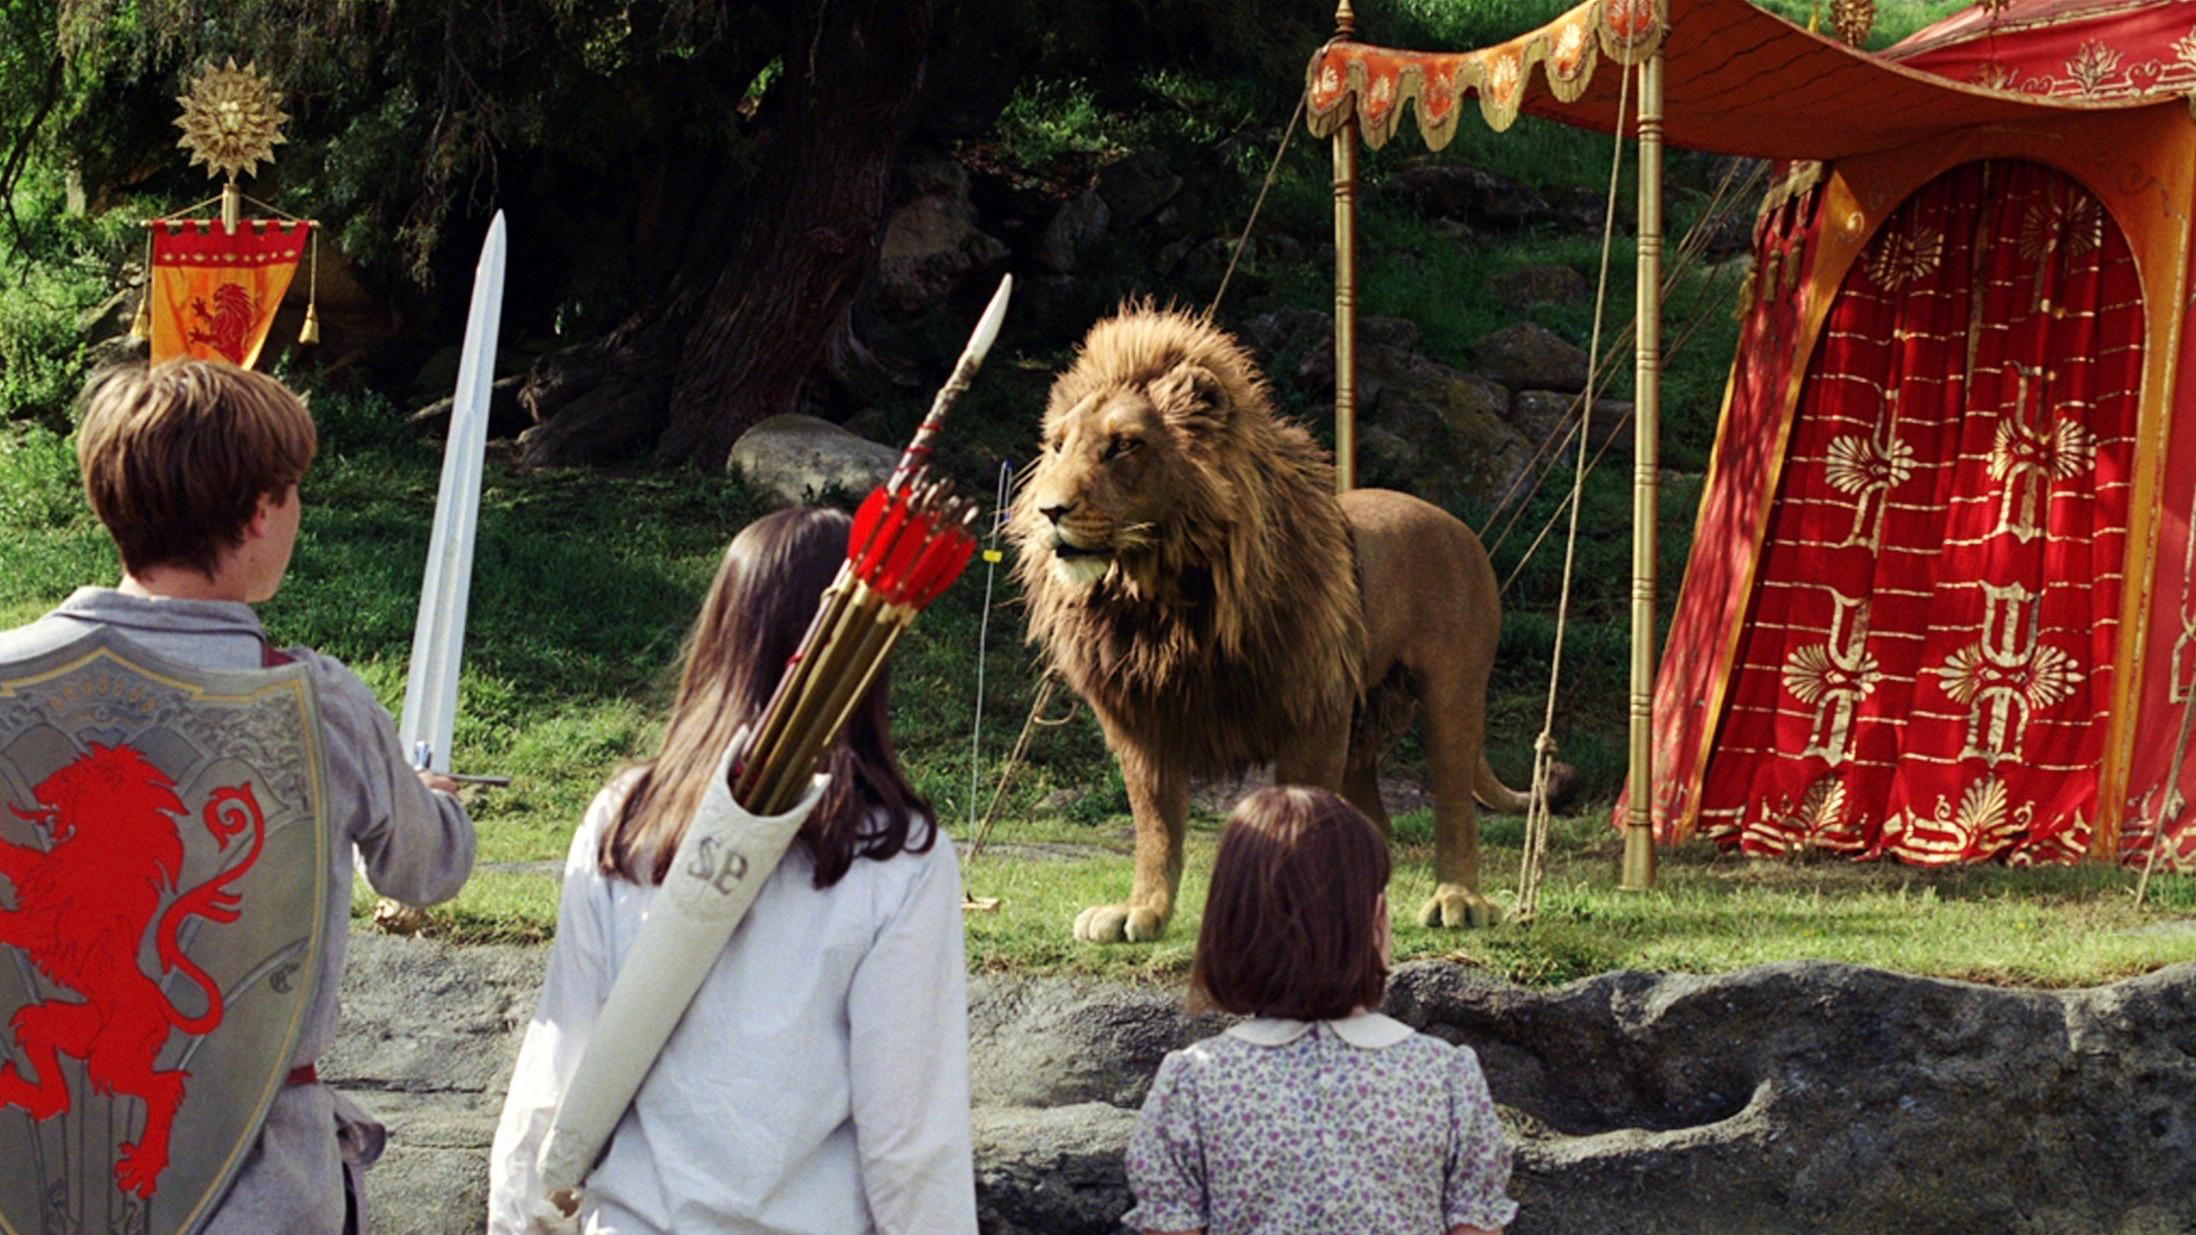 The Chronicles of Narnia; MovieStillsDB.com